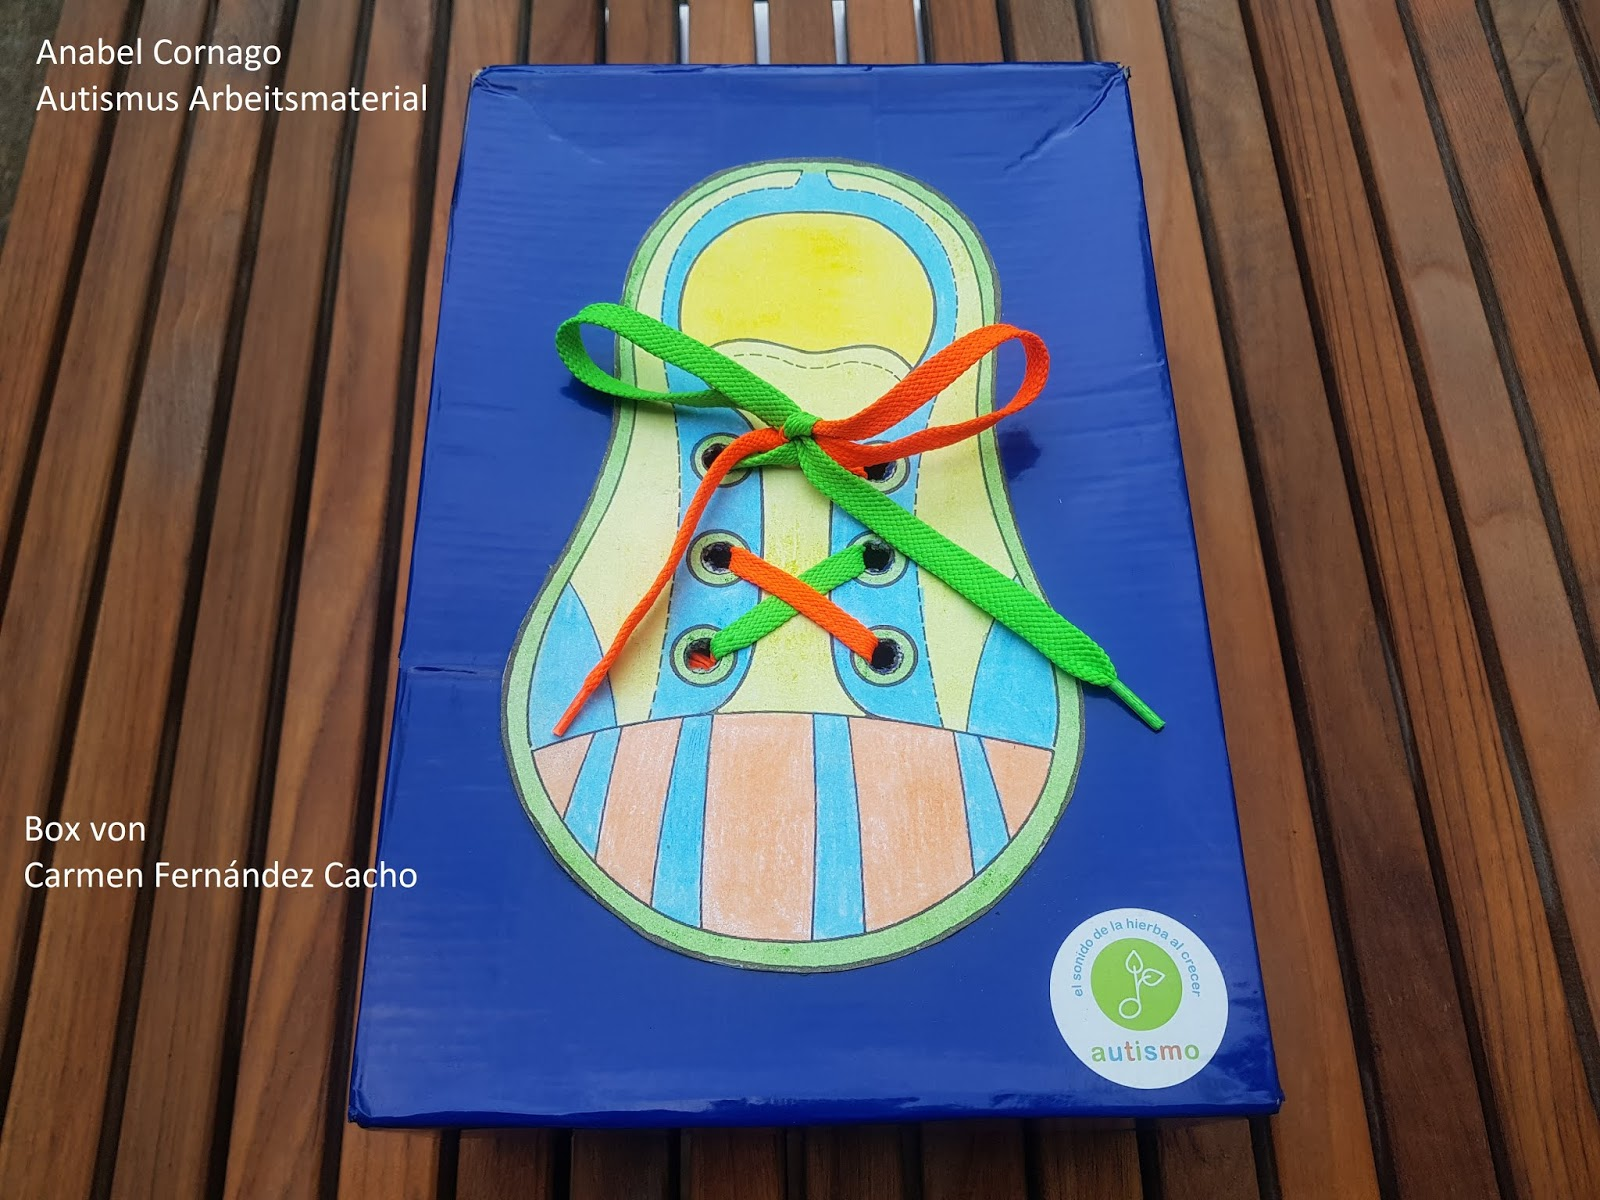 Autismus Arbeitsmaterial Schuhe Binden Lernen 2